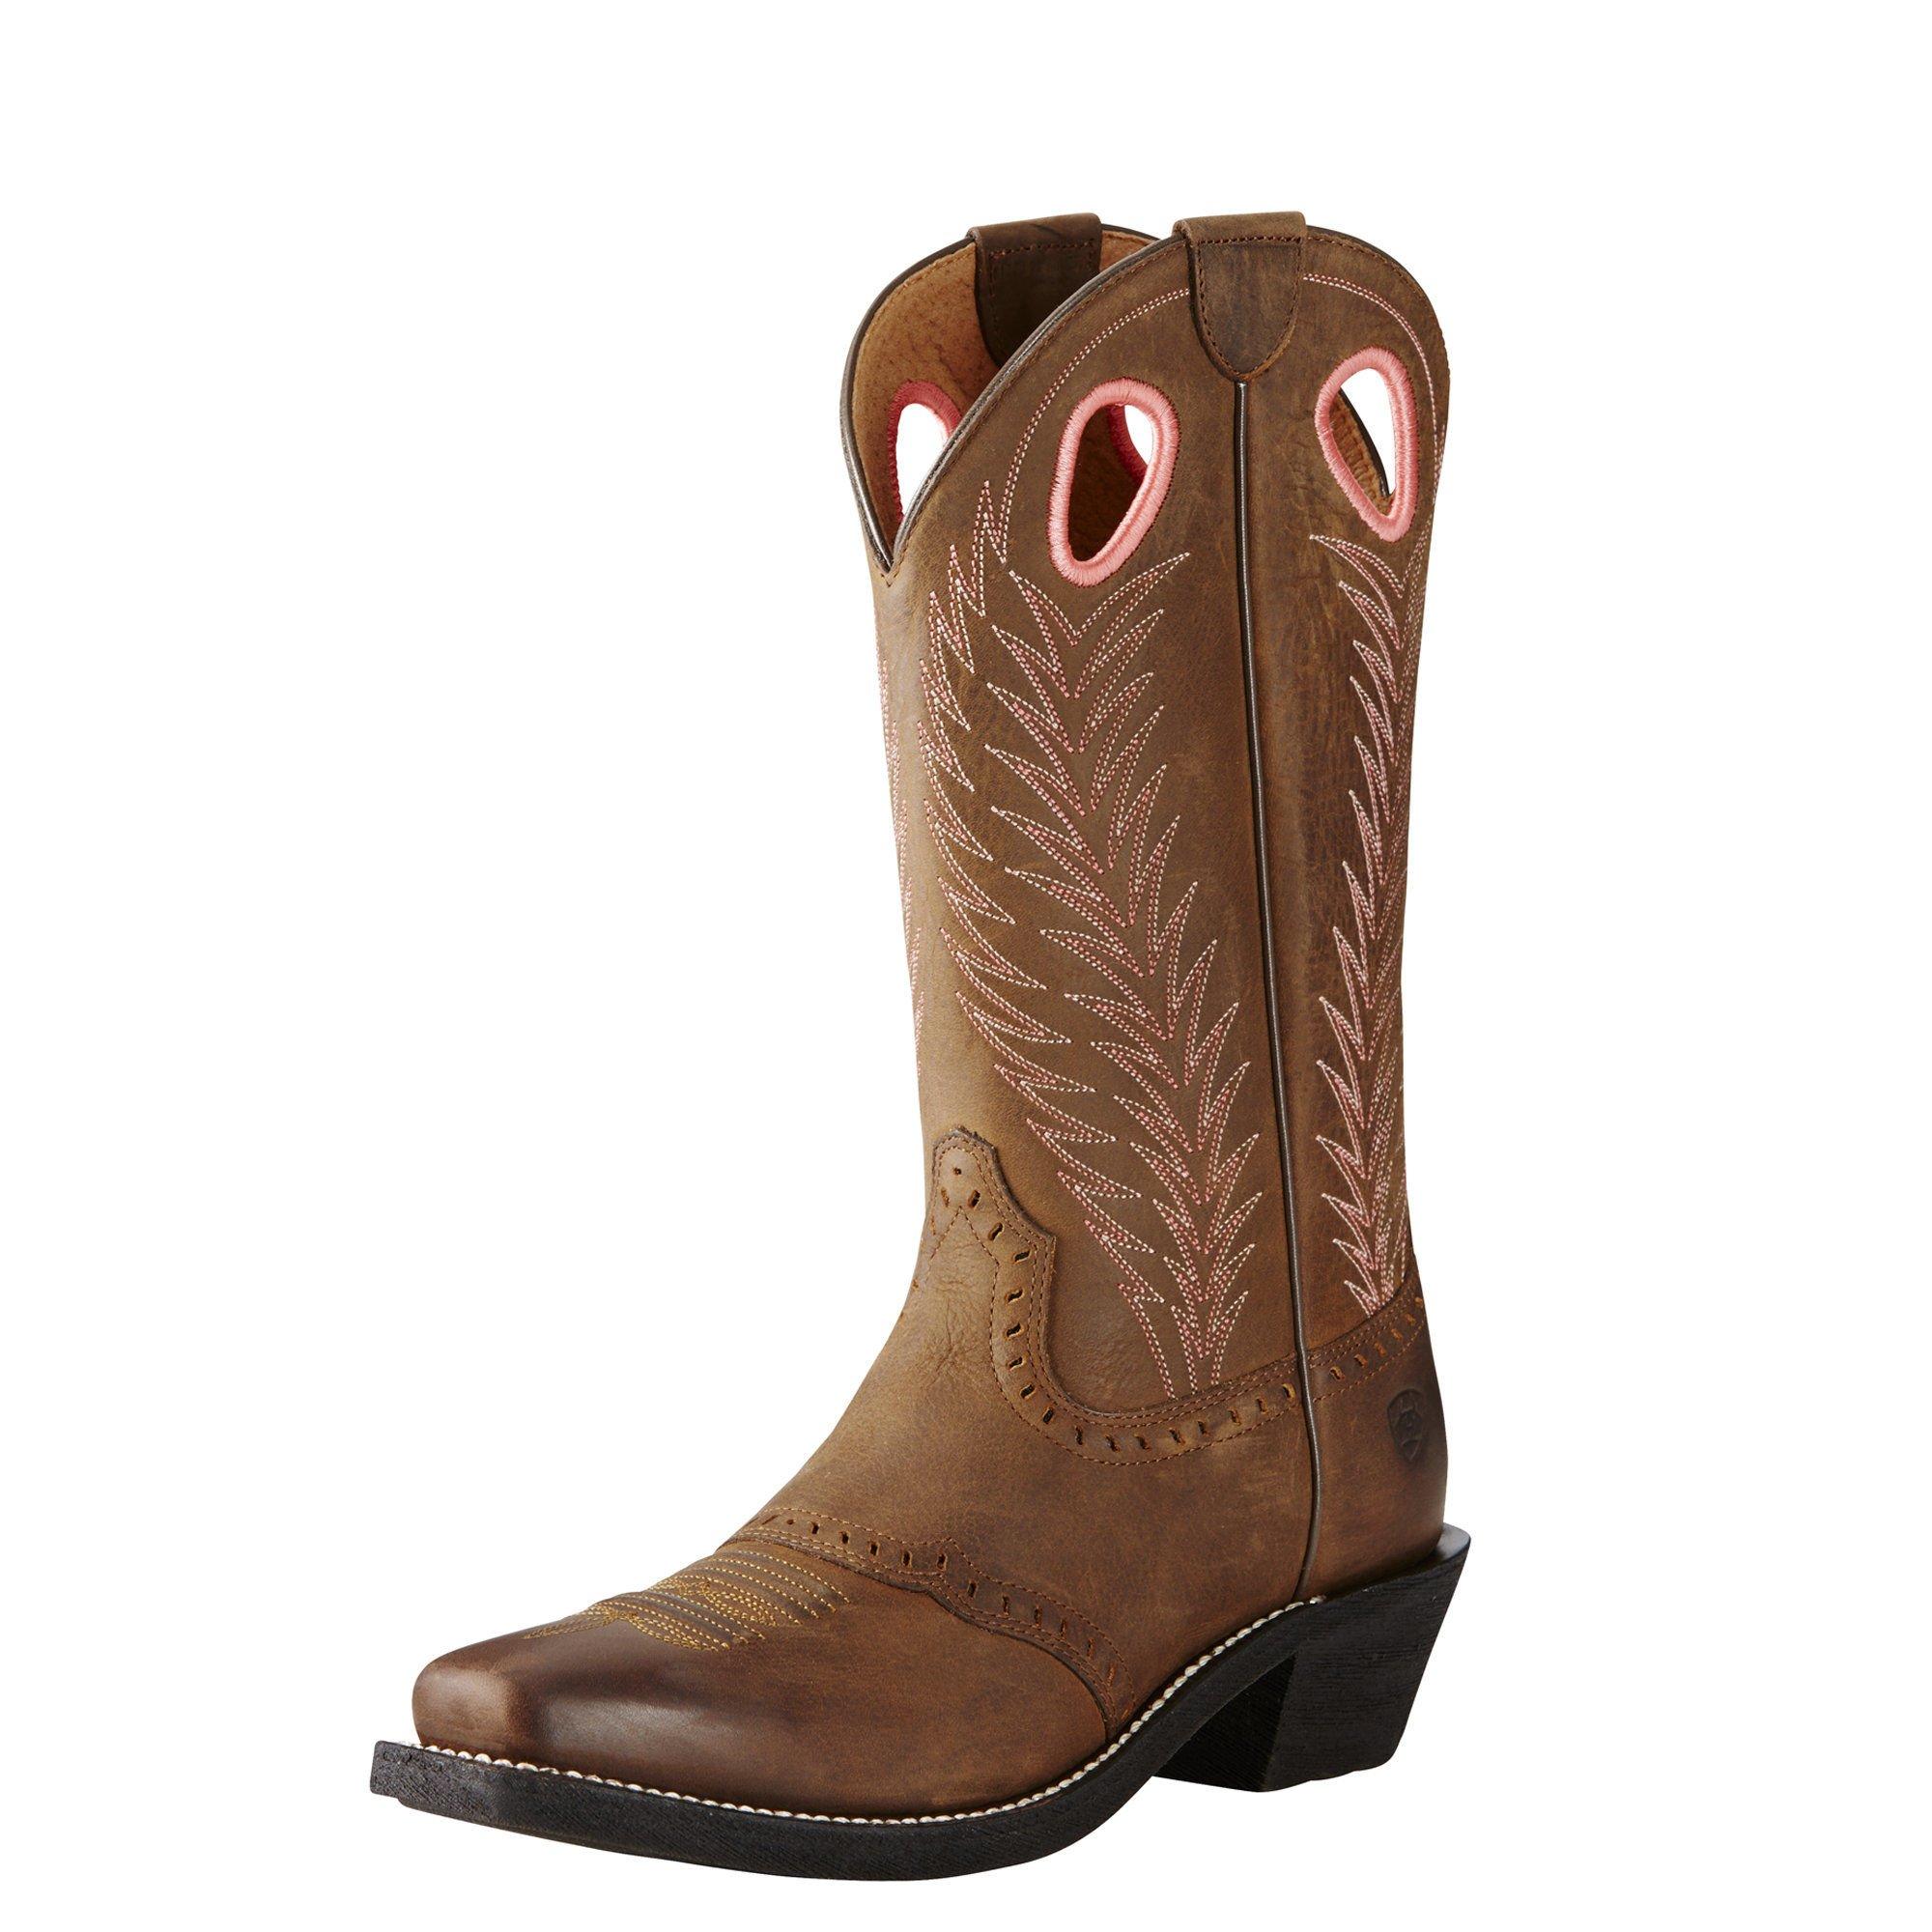 Ariat Women's Heritage Rancher Western Cowboy Boot, Mustang Mud, 6.5 B US